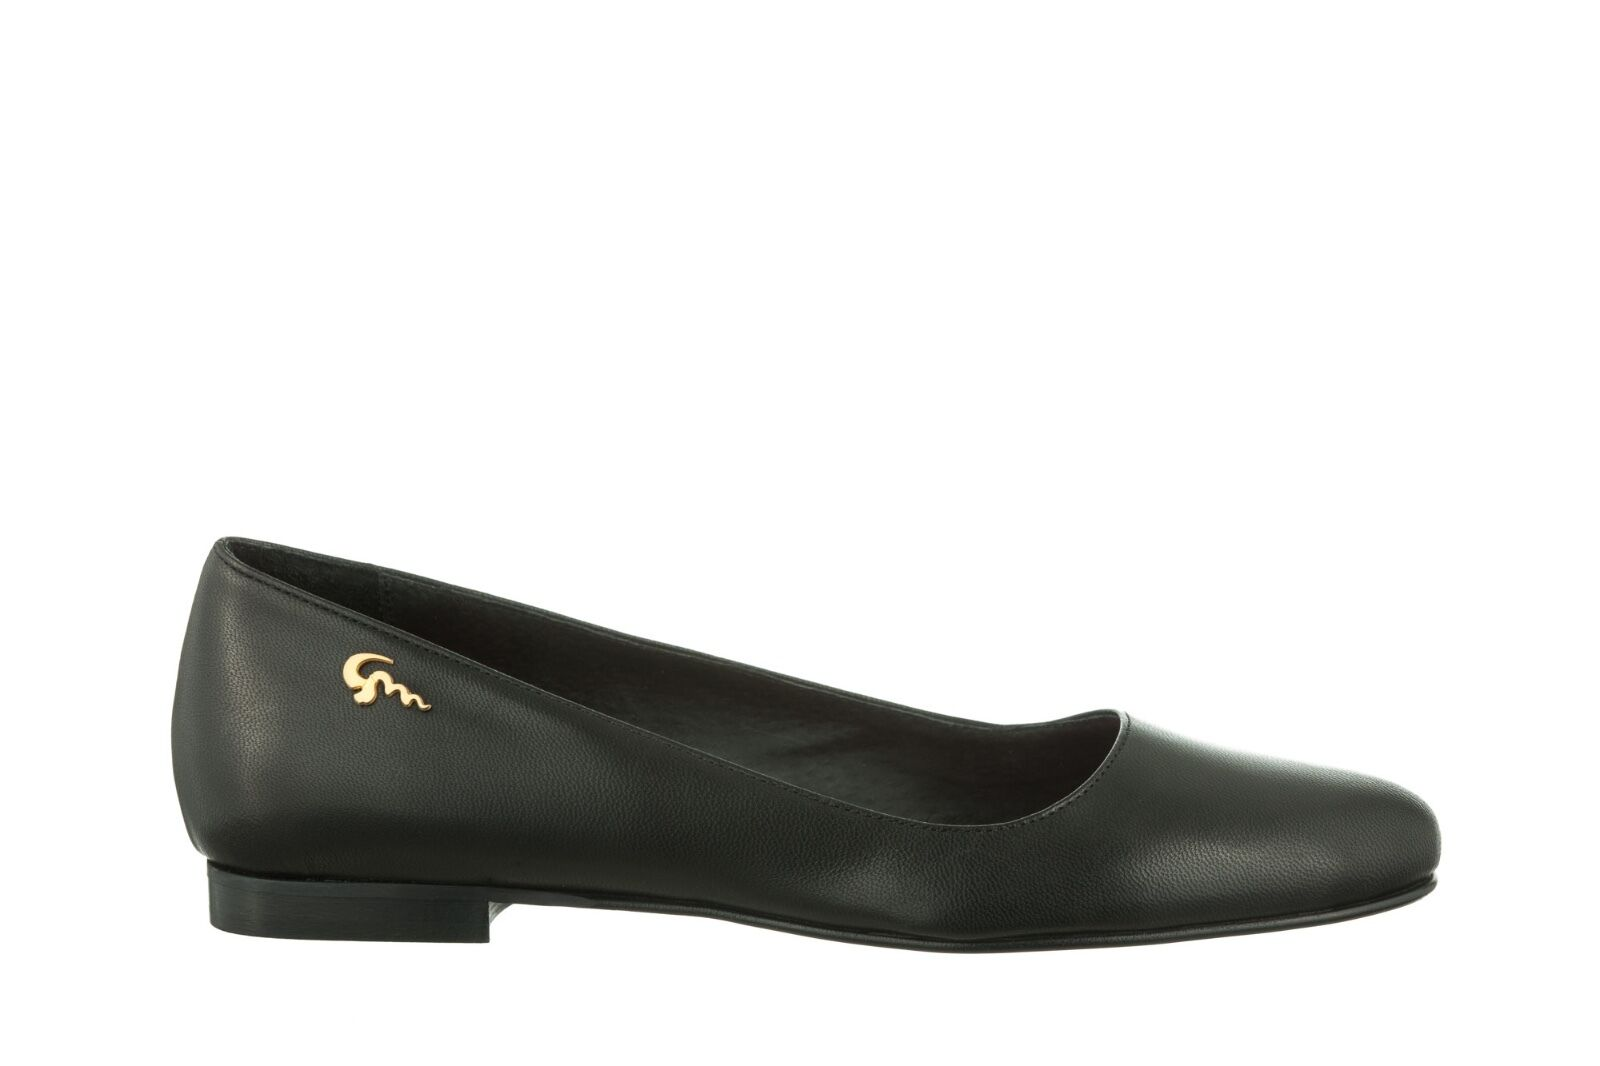 MORI MORI MORI MADE FLATS IN ITALY NEW FLATS MADE SCHUHE Schuhe BALLERINA REAL 52f96b